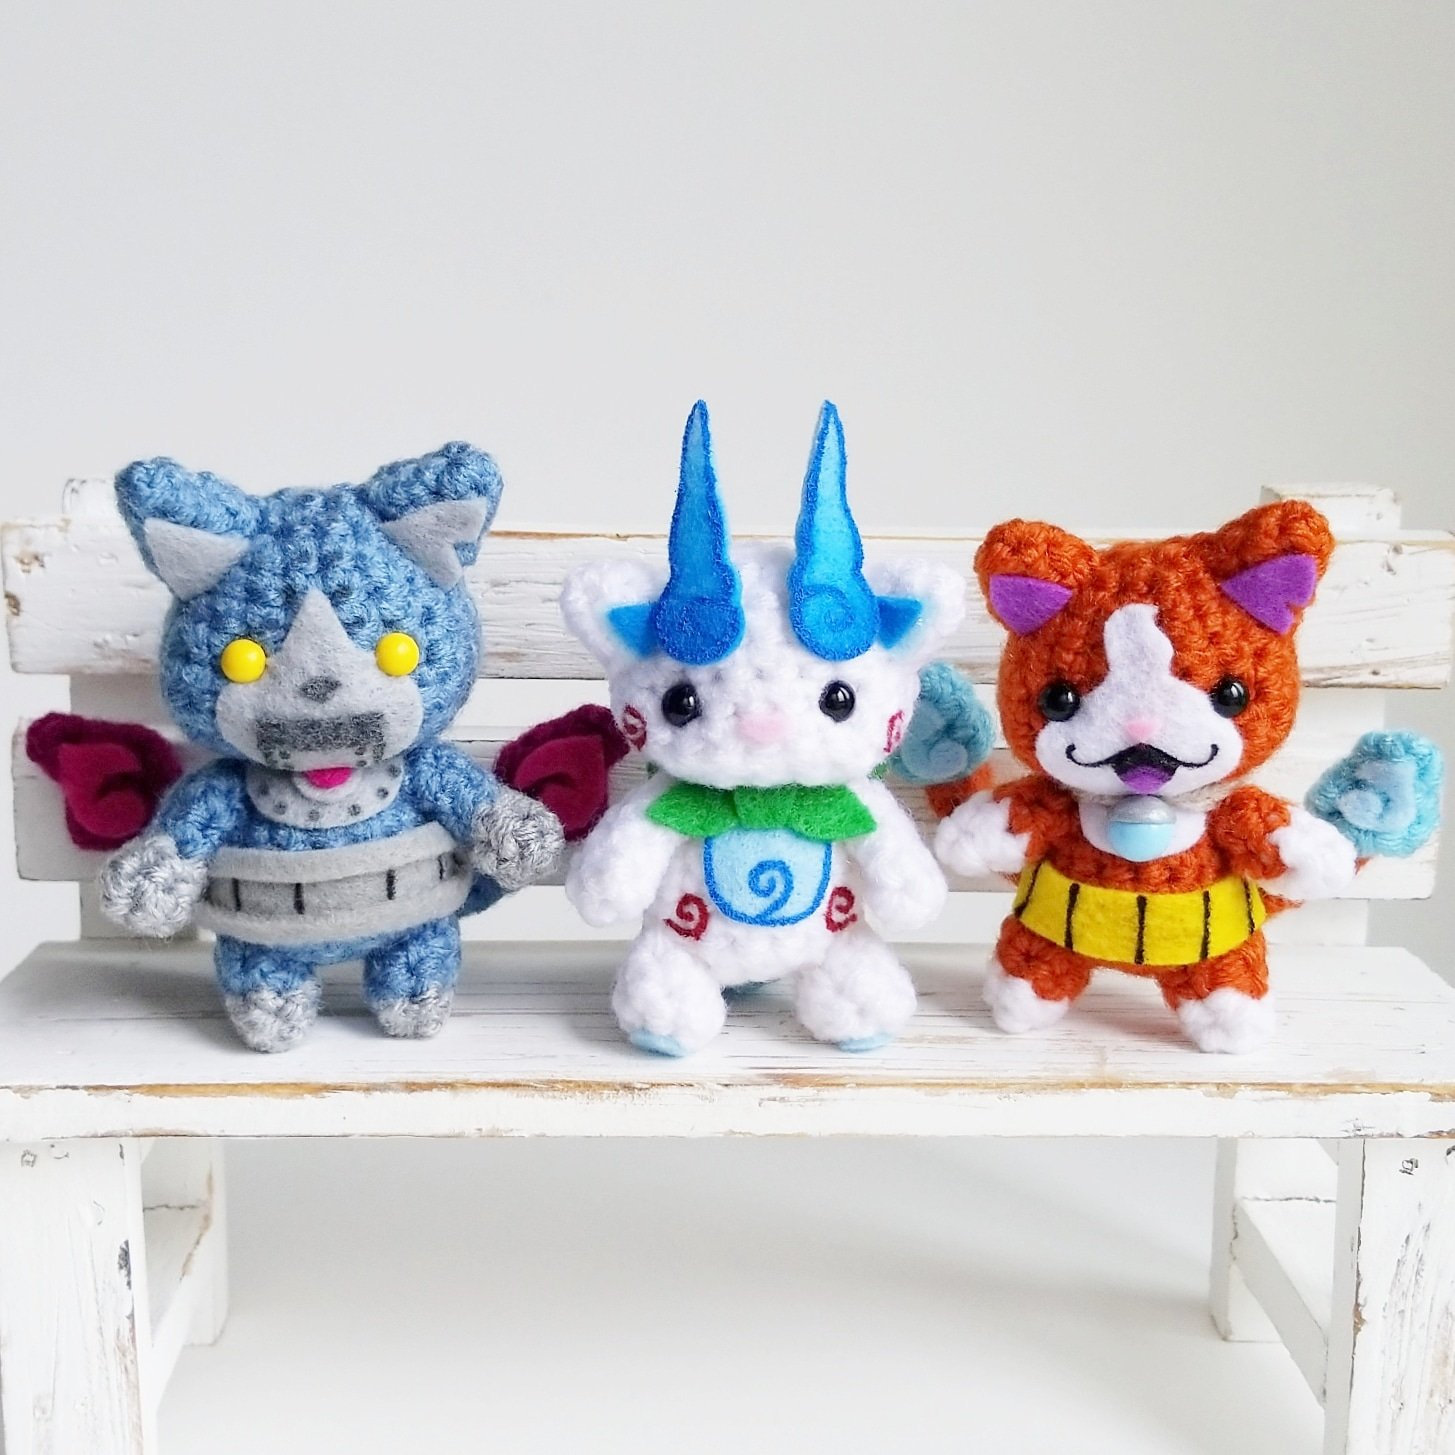 Hey Yo-kai Watch Fans, AnyaZoe Crocheted Robonyan, Koma-san and Jibanyan Amigurumi!